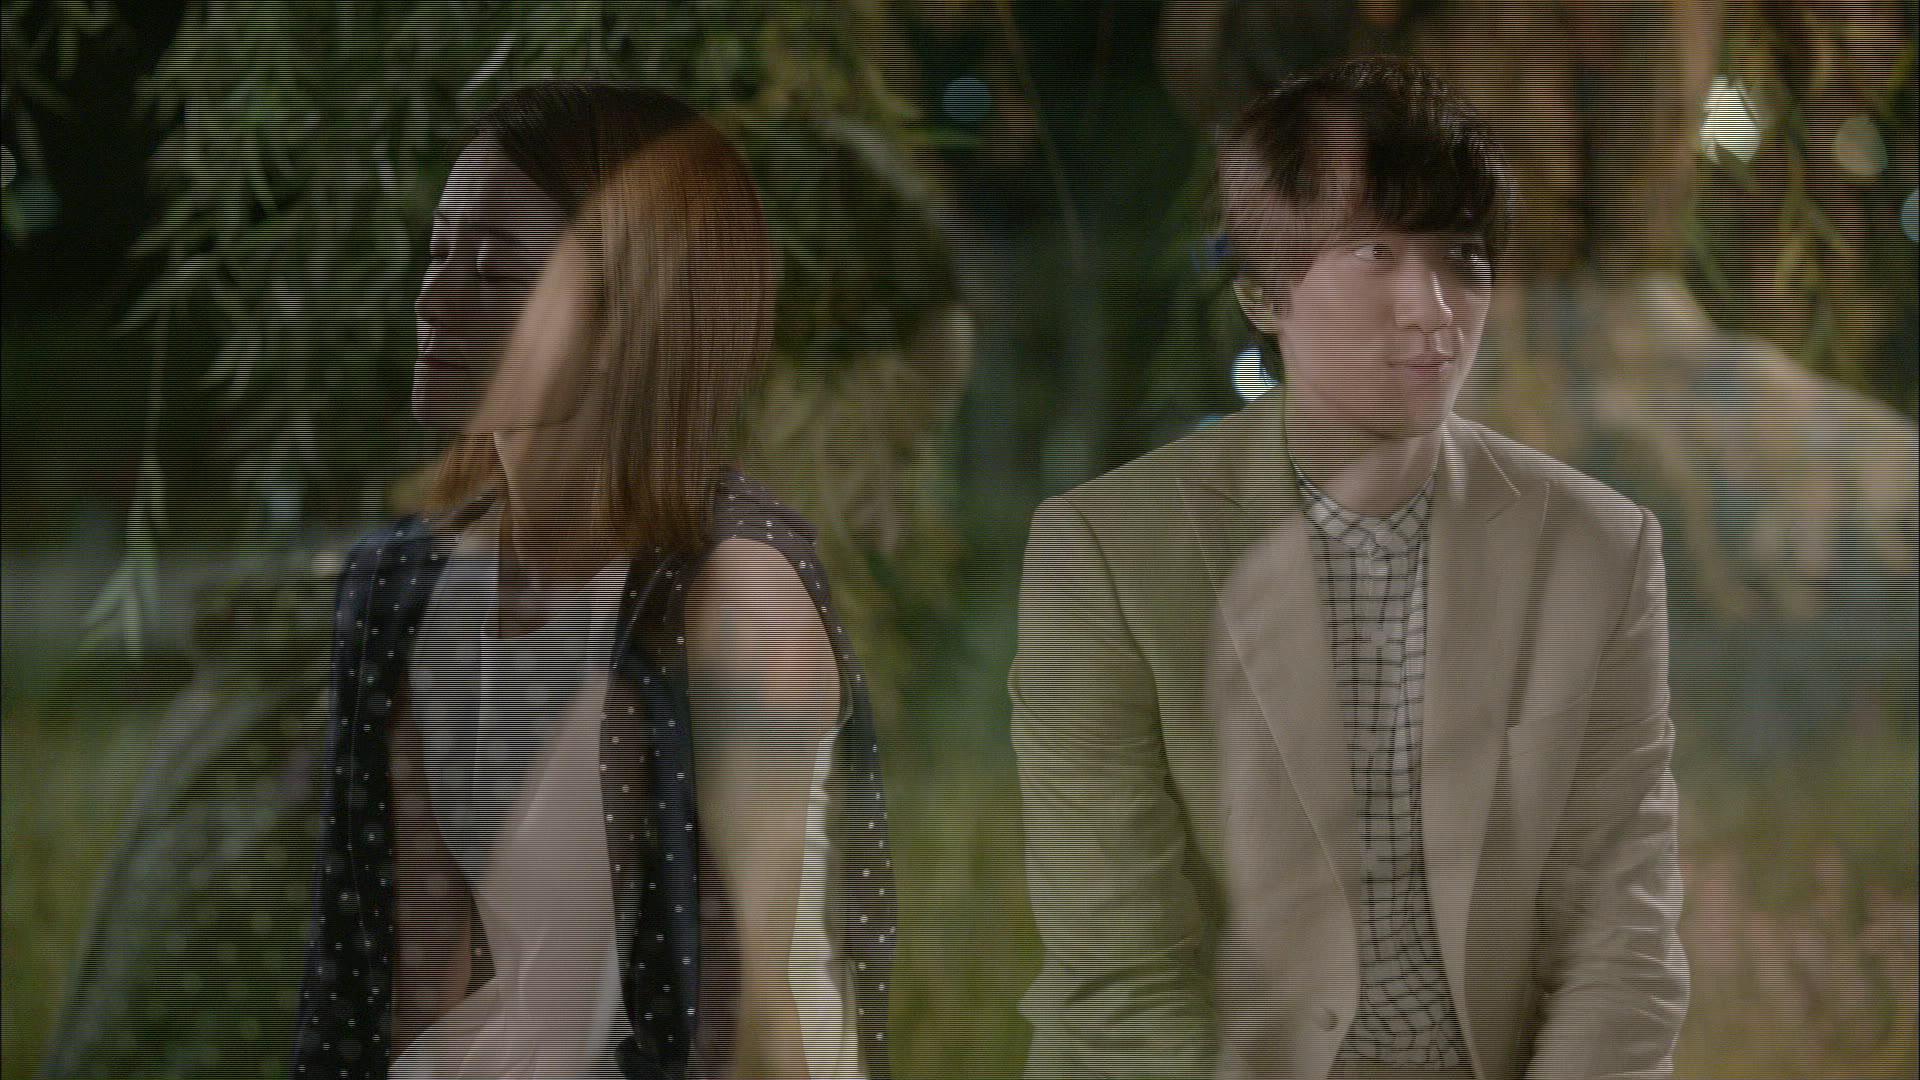 Sung Joon And Yoo Mi's Chemistry: Discovery of Love